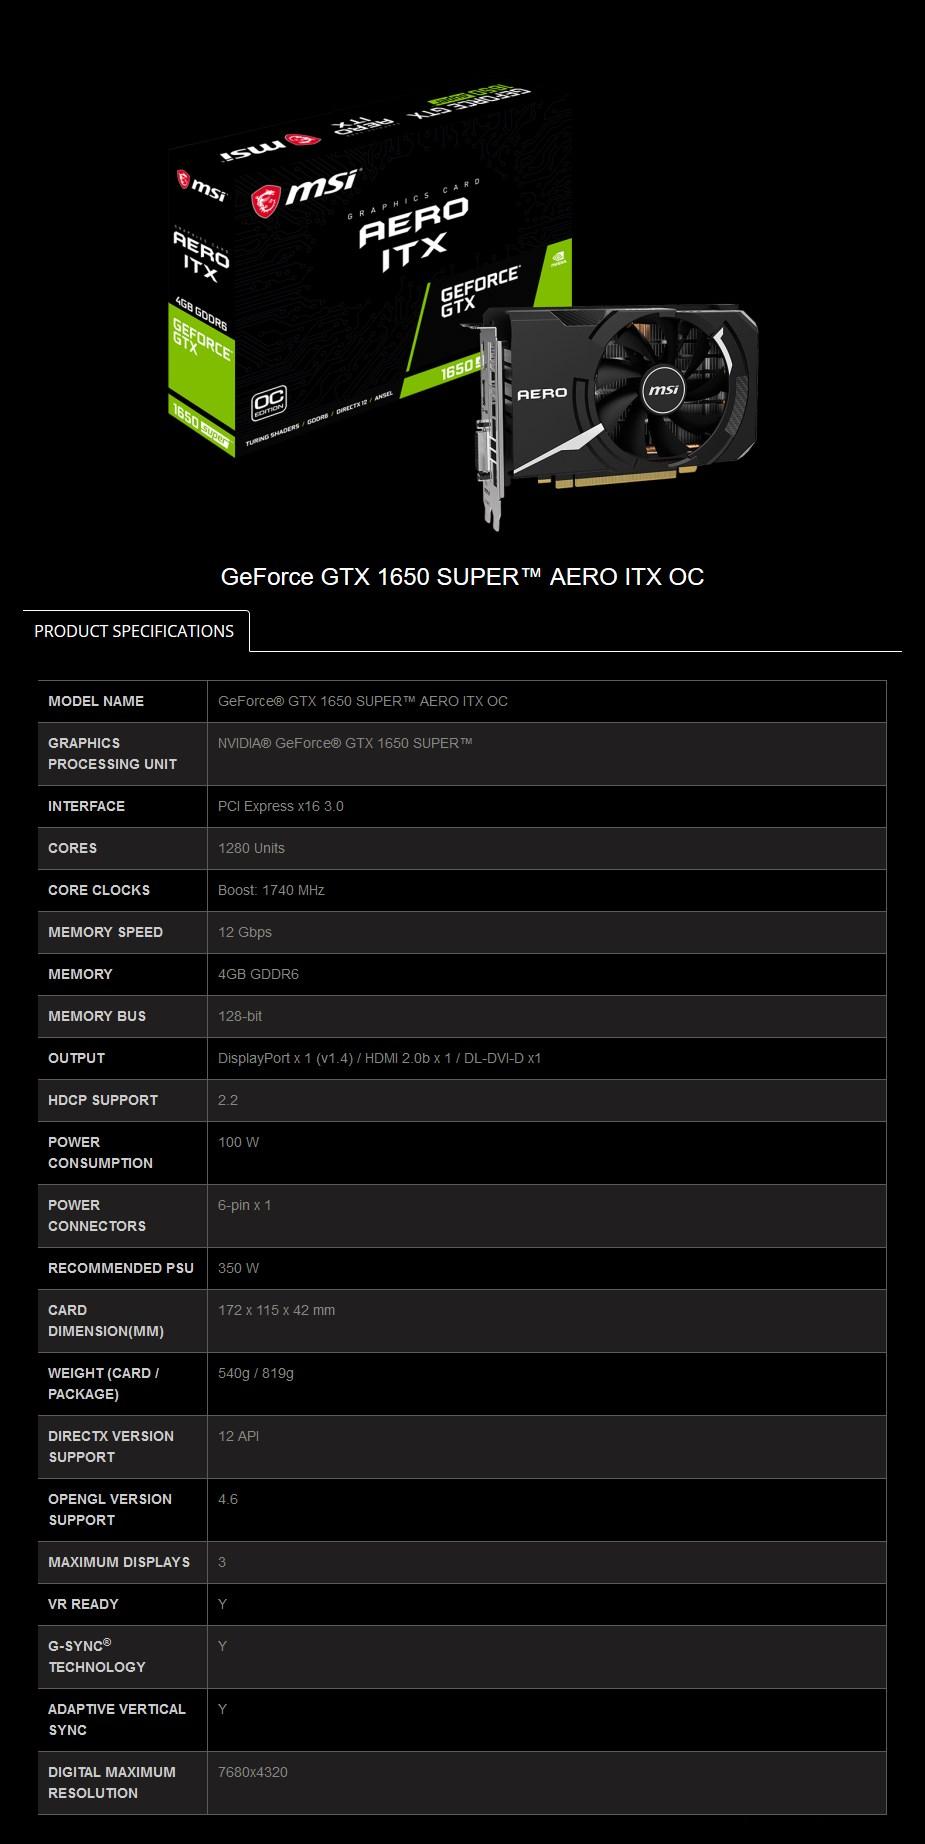 MSI GeForce GTX 1650 SUPER AERO ITX OC 4GB Video Card - Overview 2